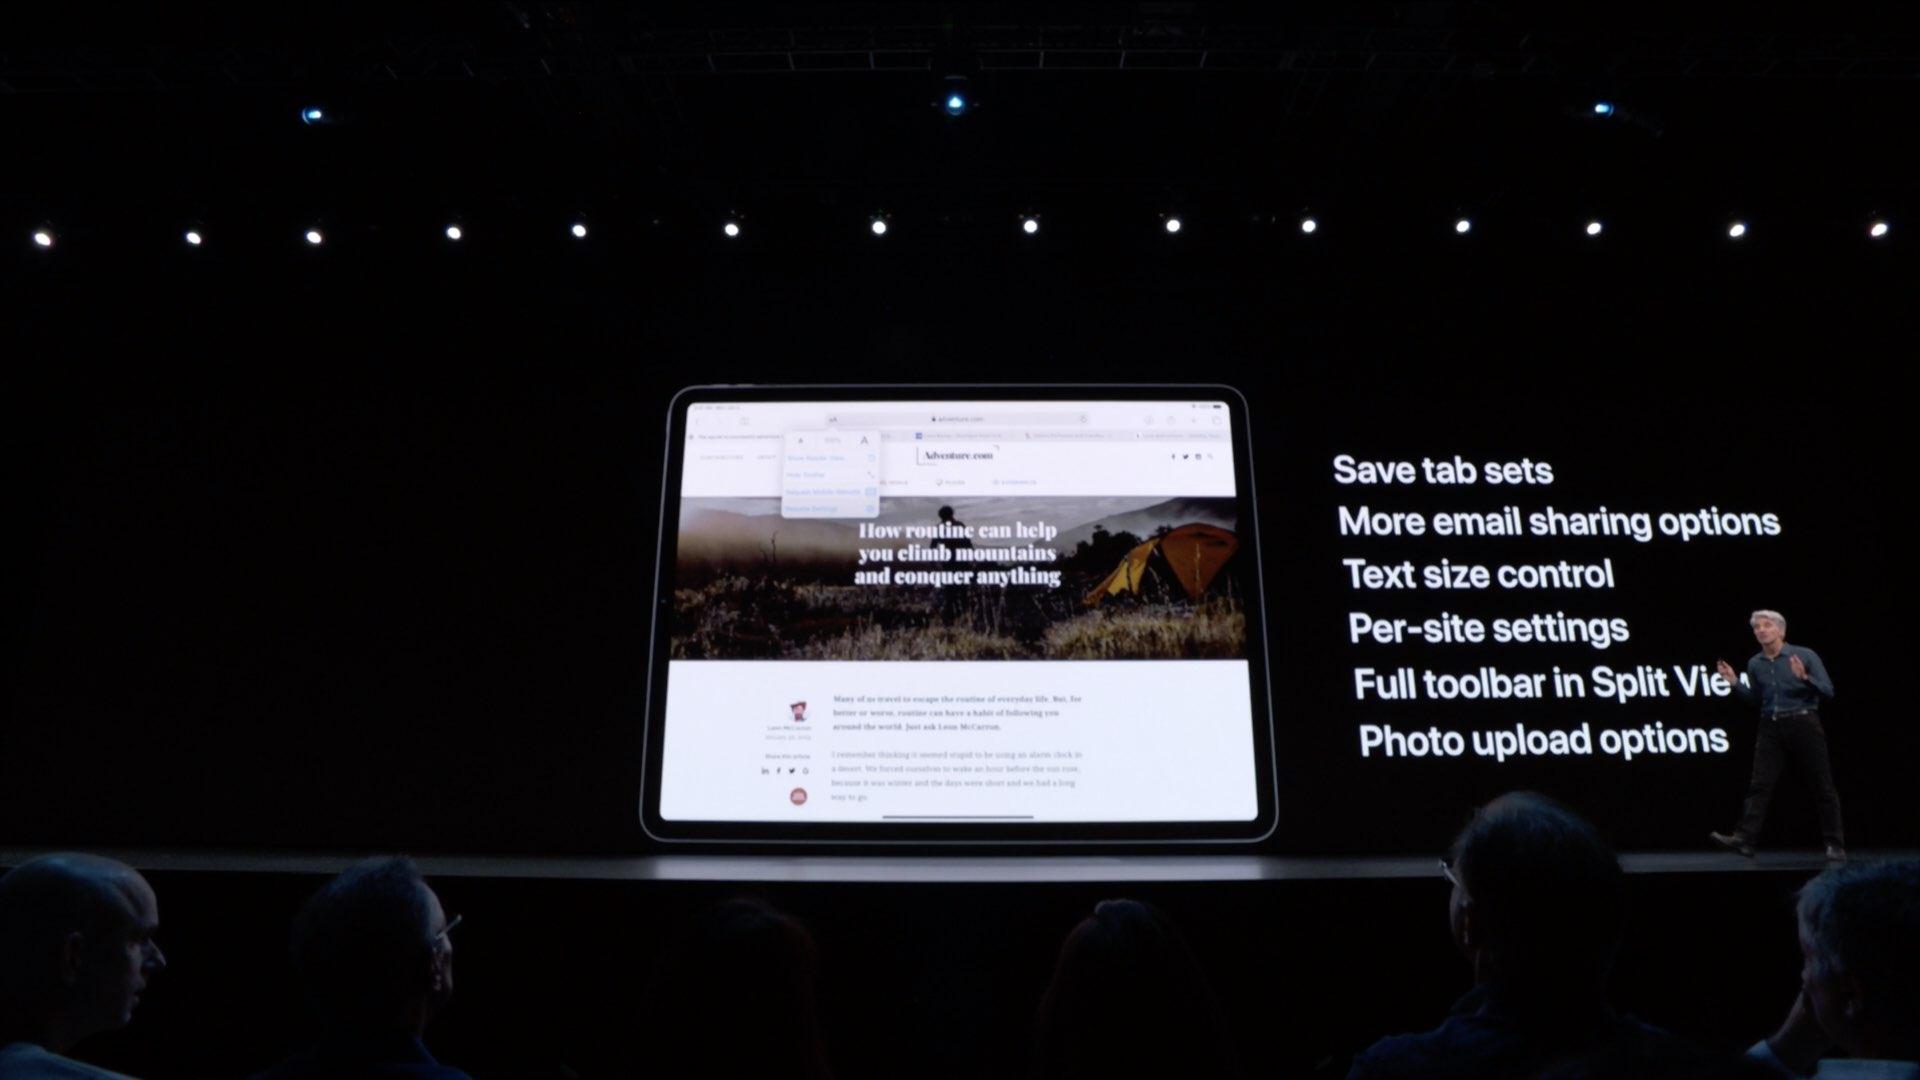 Safari in iPadOS brings desktop websites, but that's only